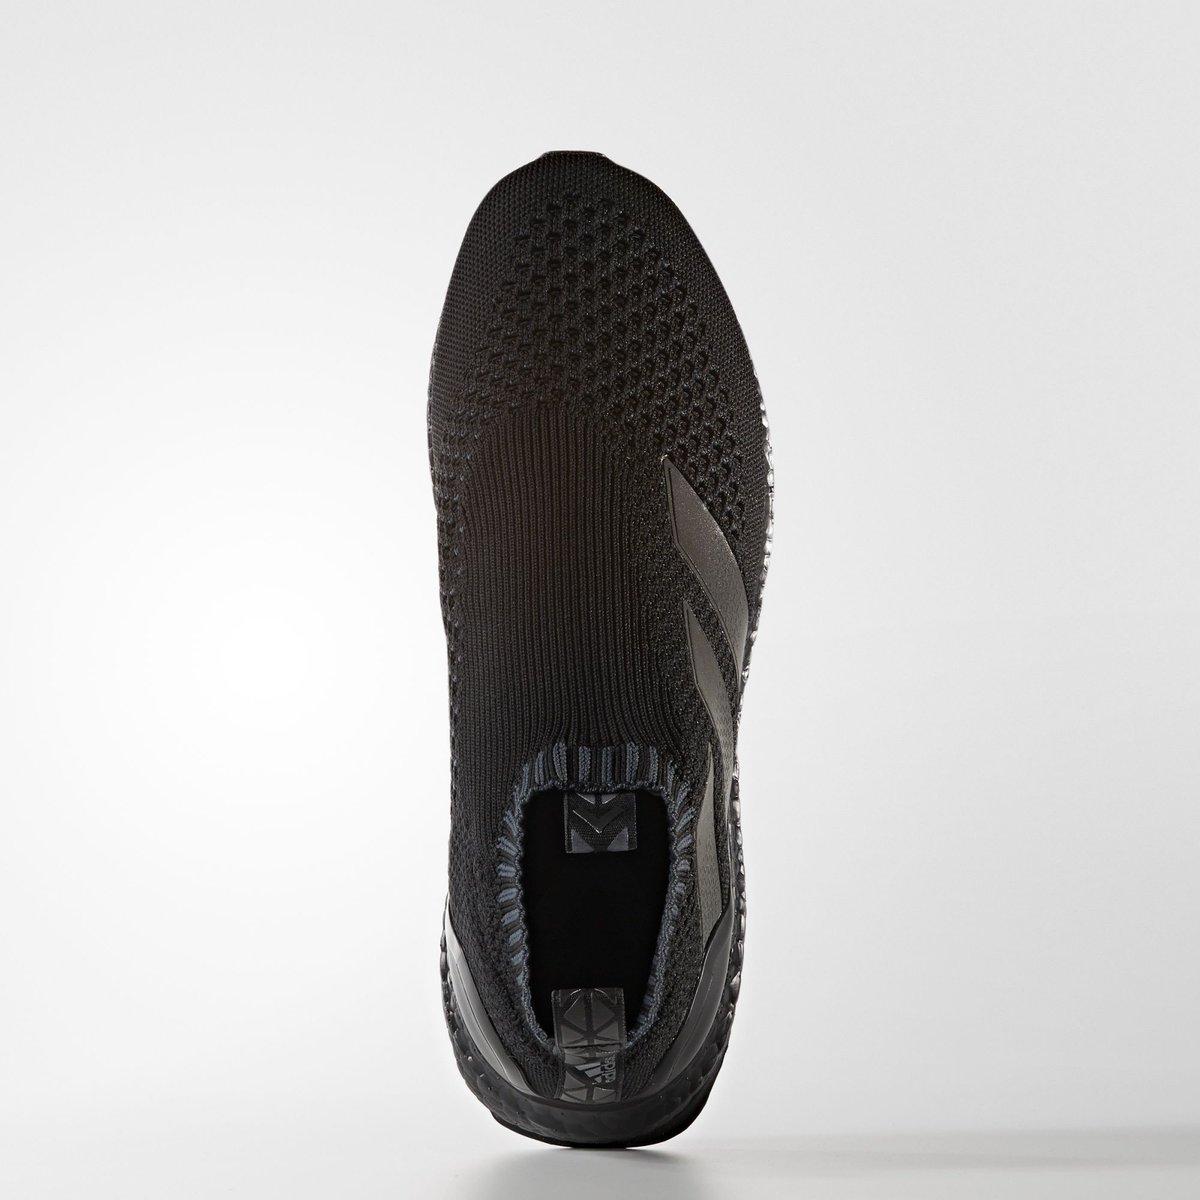 super popular 2054e 0cd65 adidas ACE 16+ Pure Control Ultra Boost Launching at 9am GMT Link   httpbit.ly2hHMKAc pic.twitter.comtcdhurkNk0